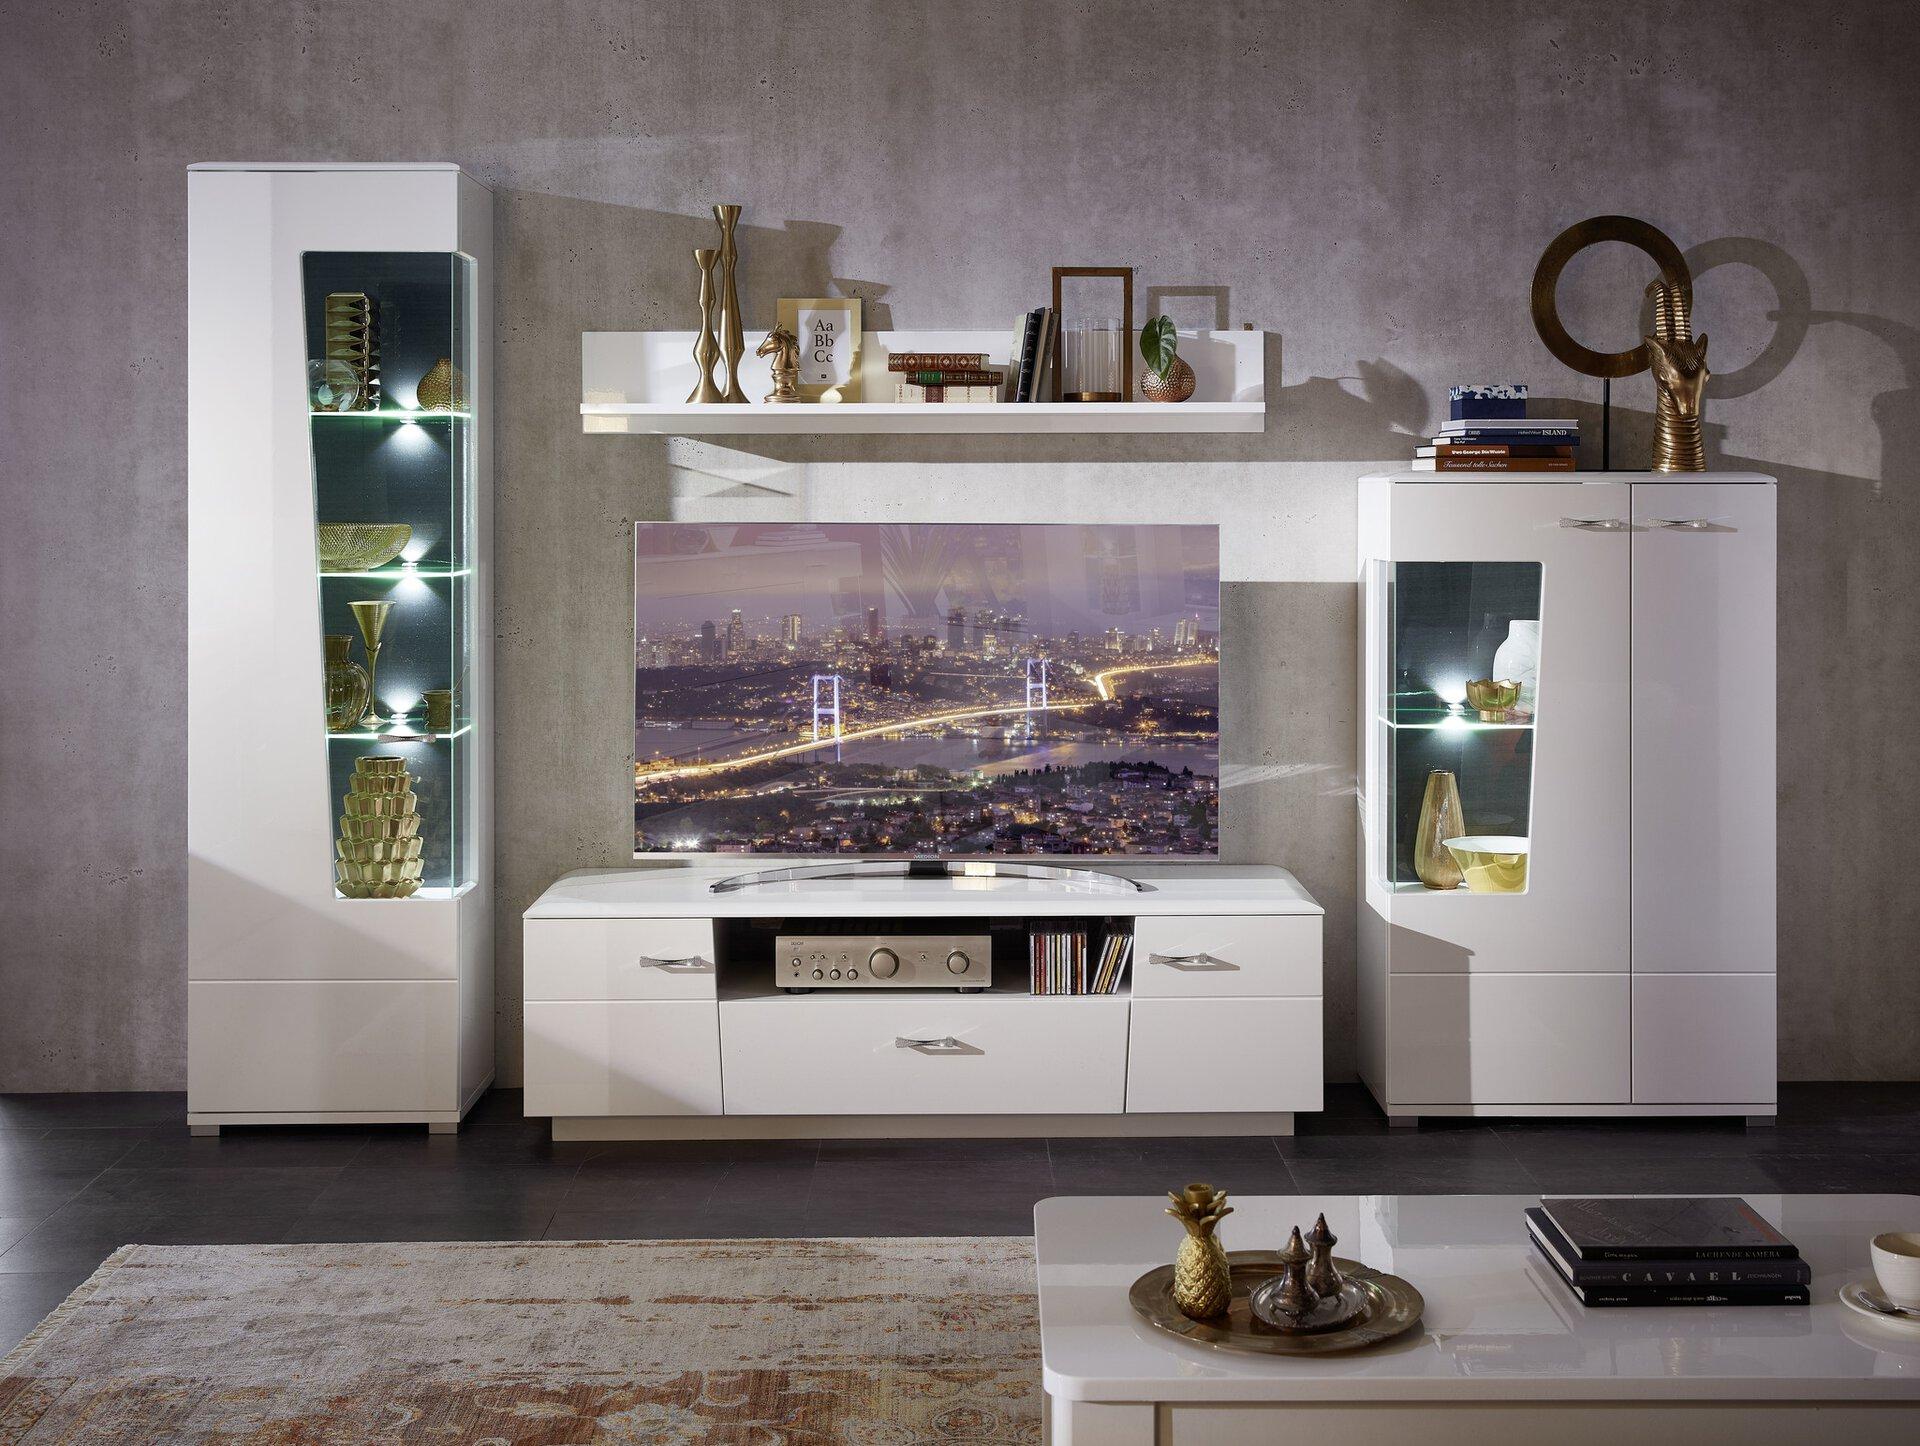 Wohnwand ALIBABA CELECT Holzwerkstoff mehrfarbig 52 x 199 x 315 cm